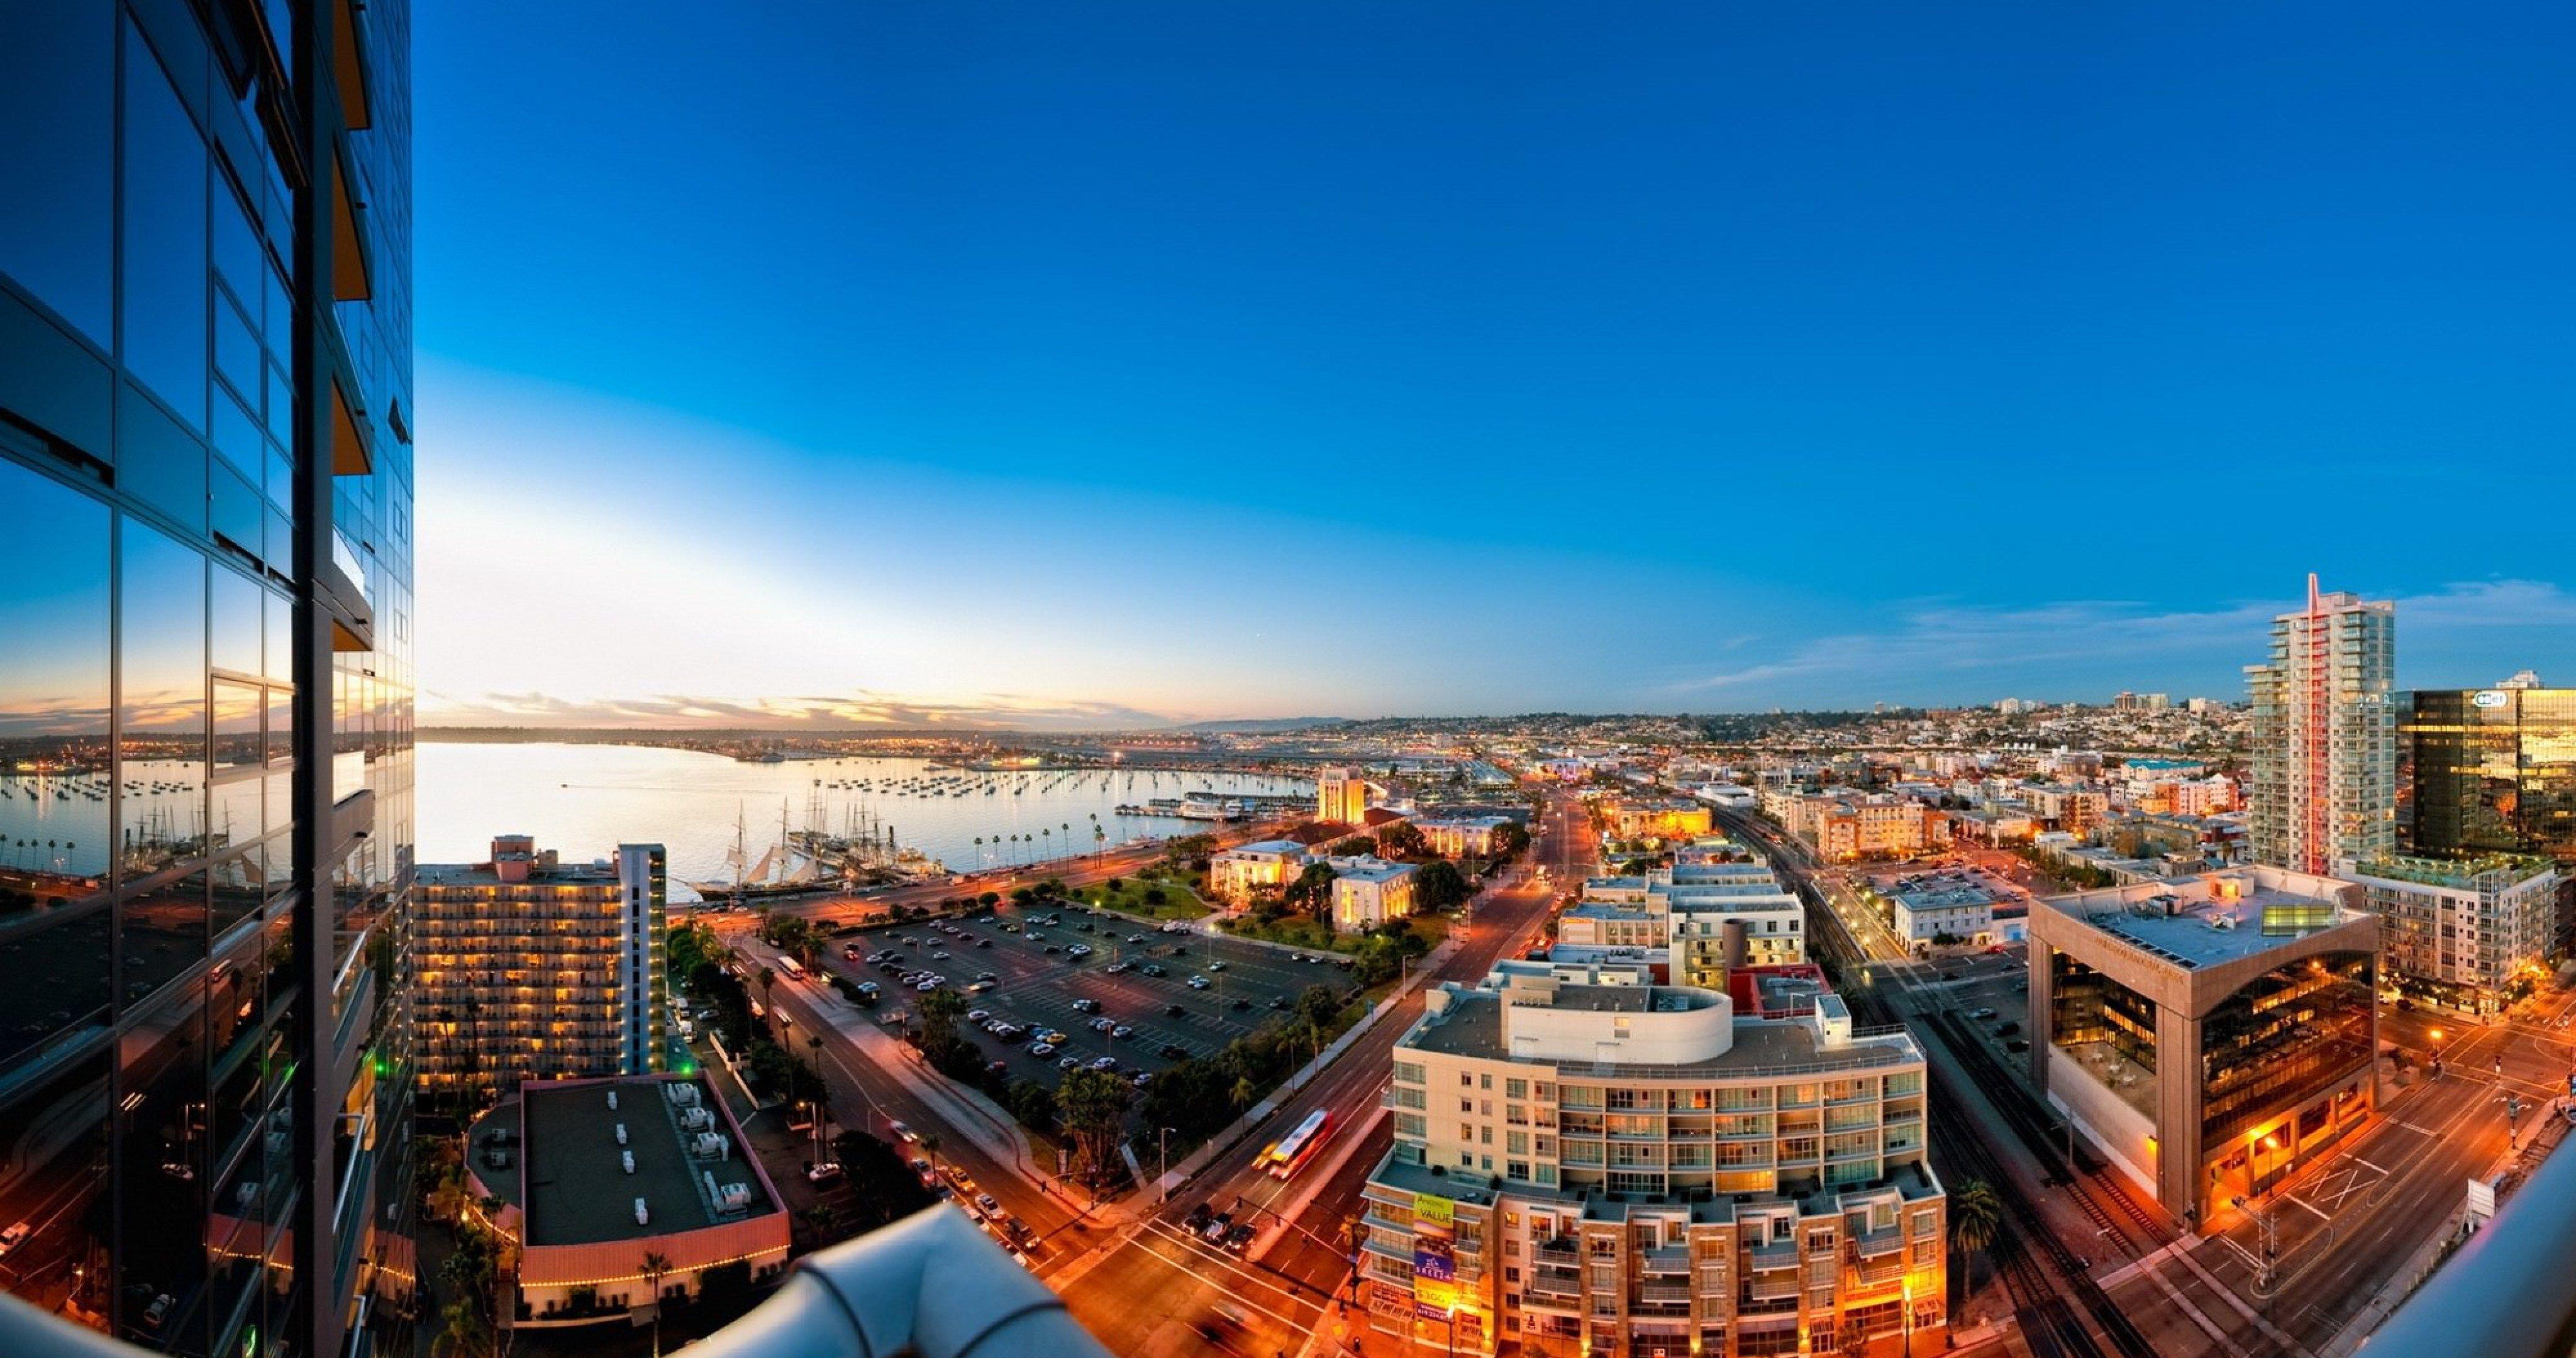 San Diego City 4k Ultra Hd Wallpaper San Diego City Panoramic City